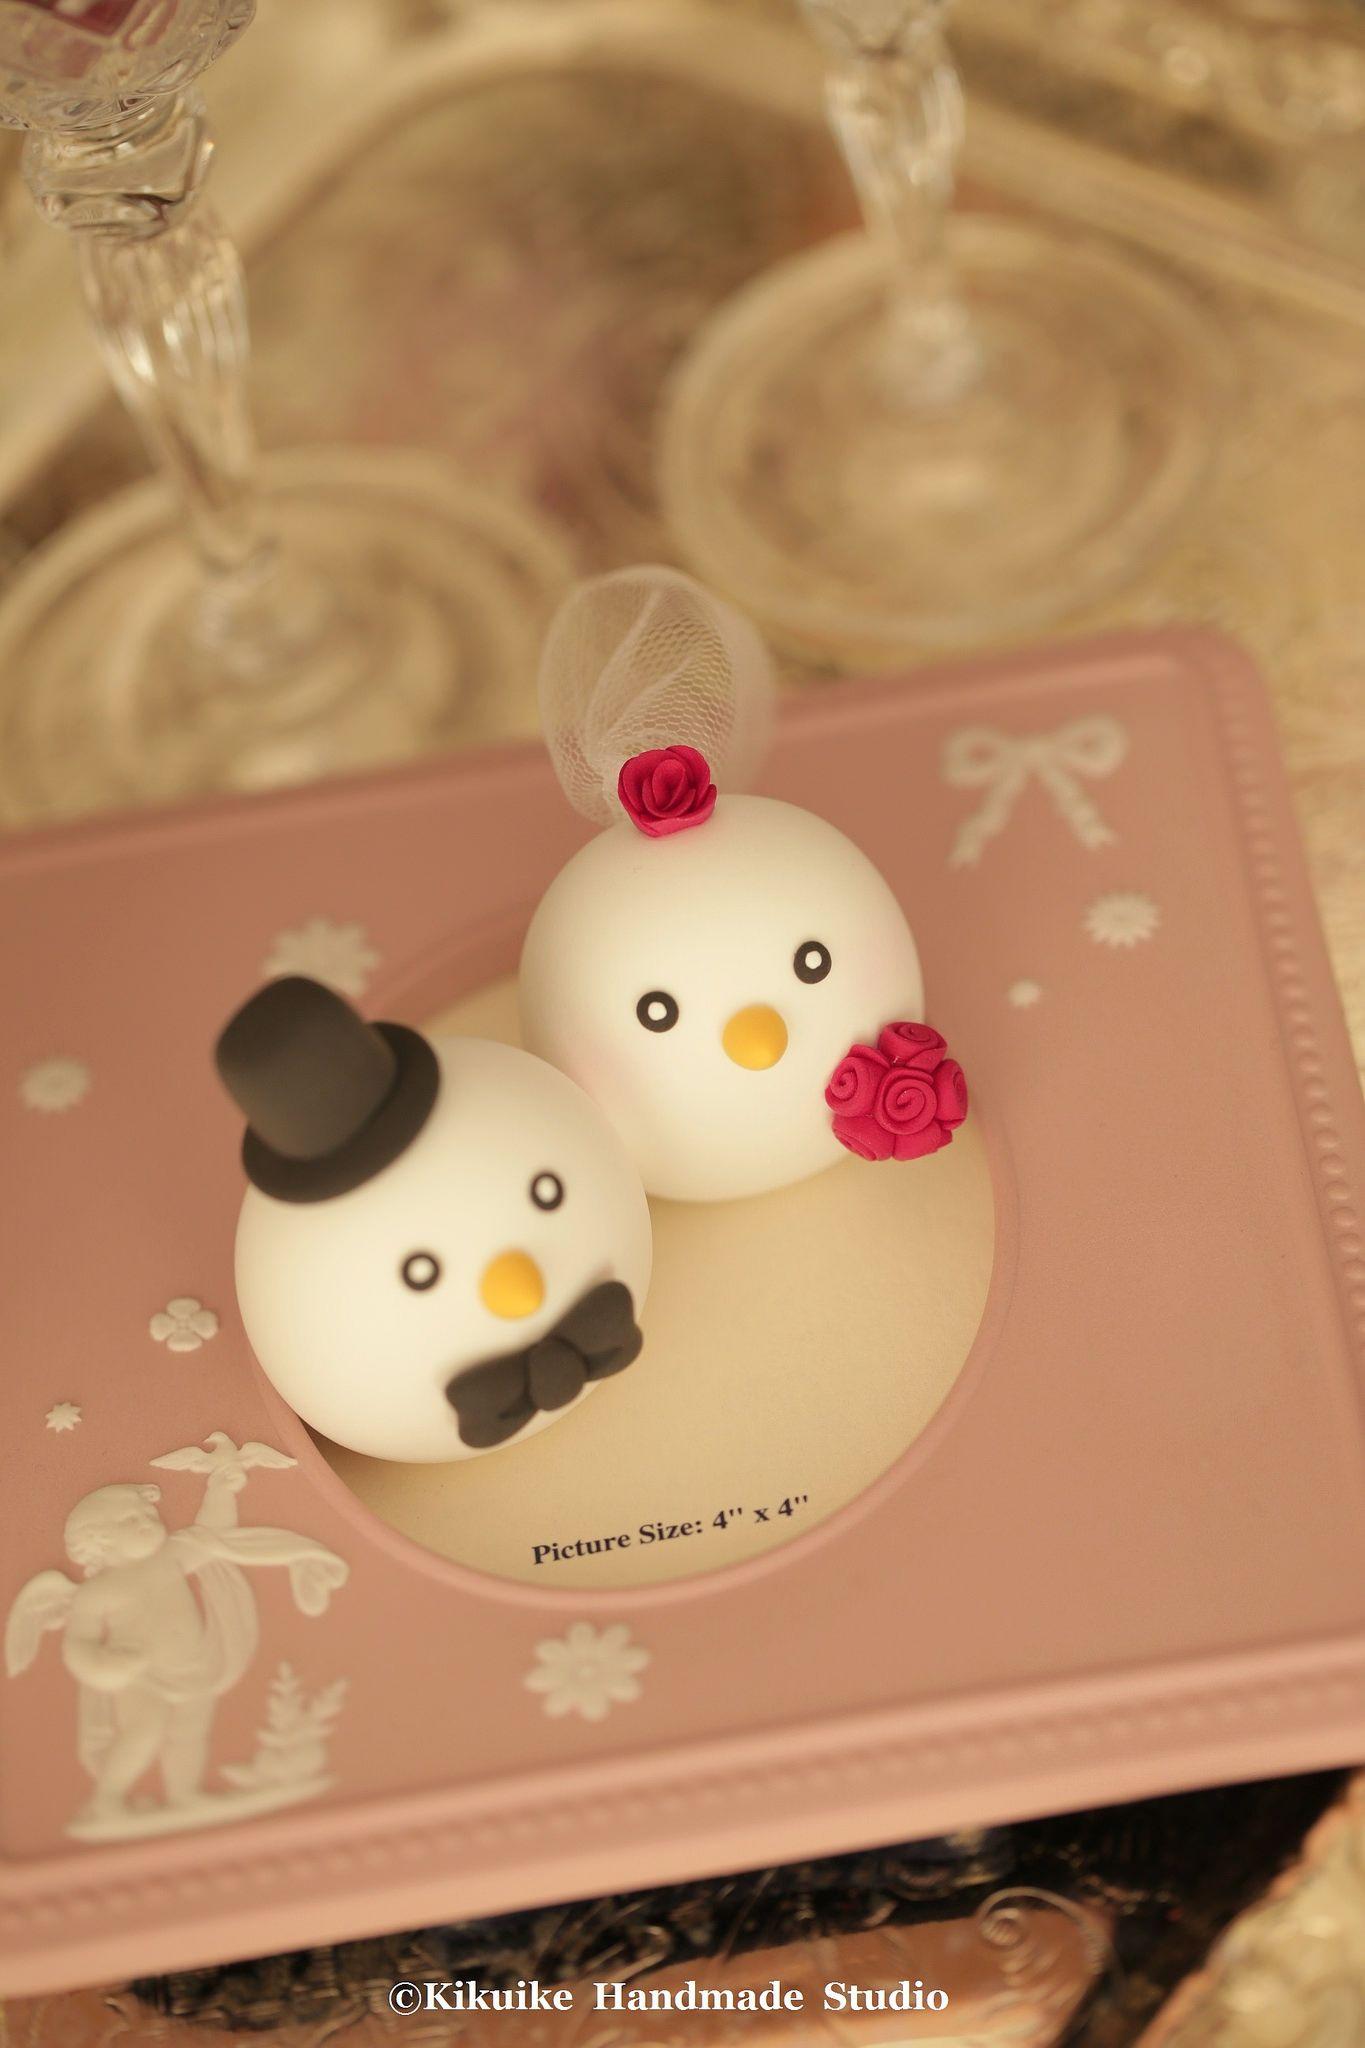 https://flic.kr/p/Bz5TCZ | Birds wedding cake topper,love birds wedding cake topper | www.etsy.com/listing/229055666/birds-wedding-cake-topperl...